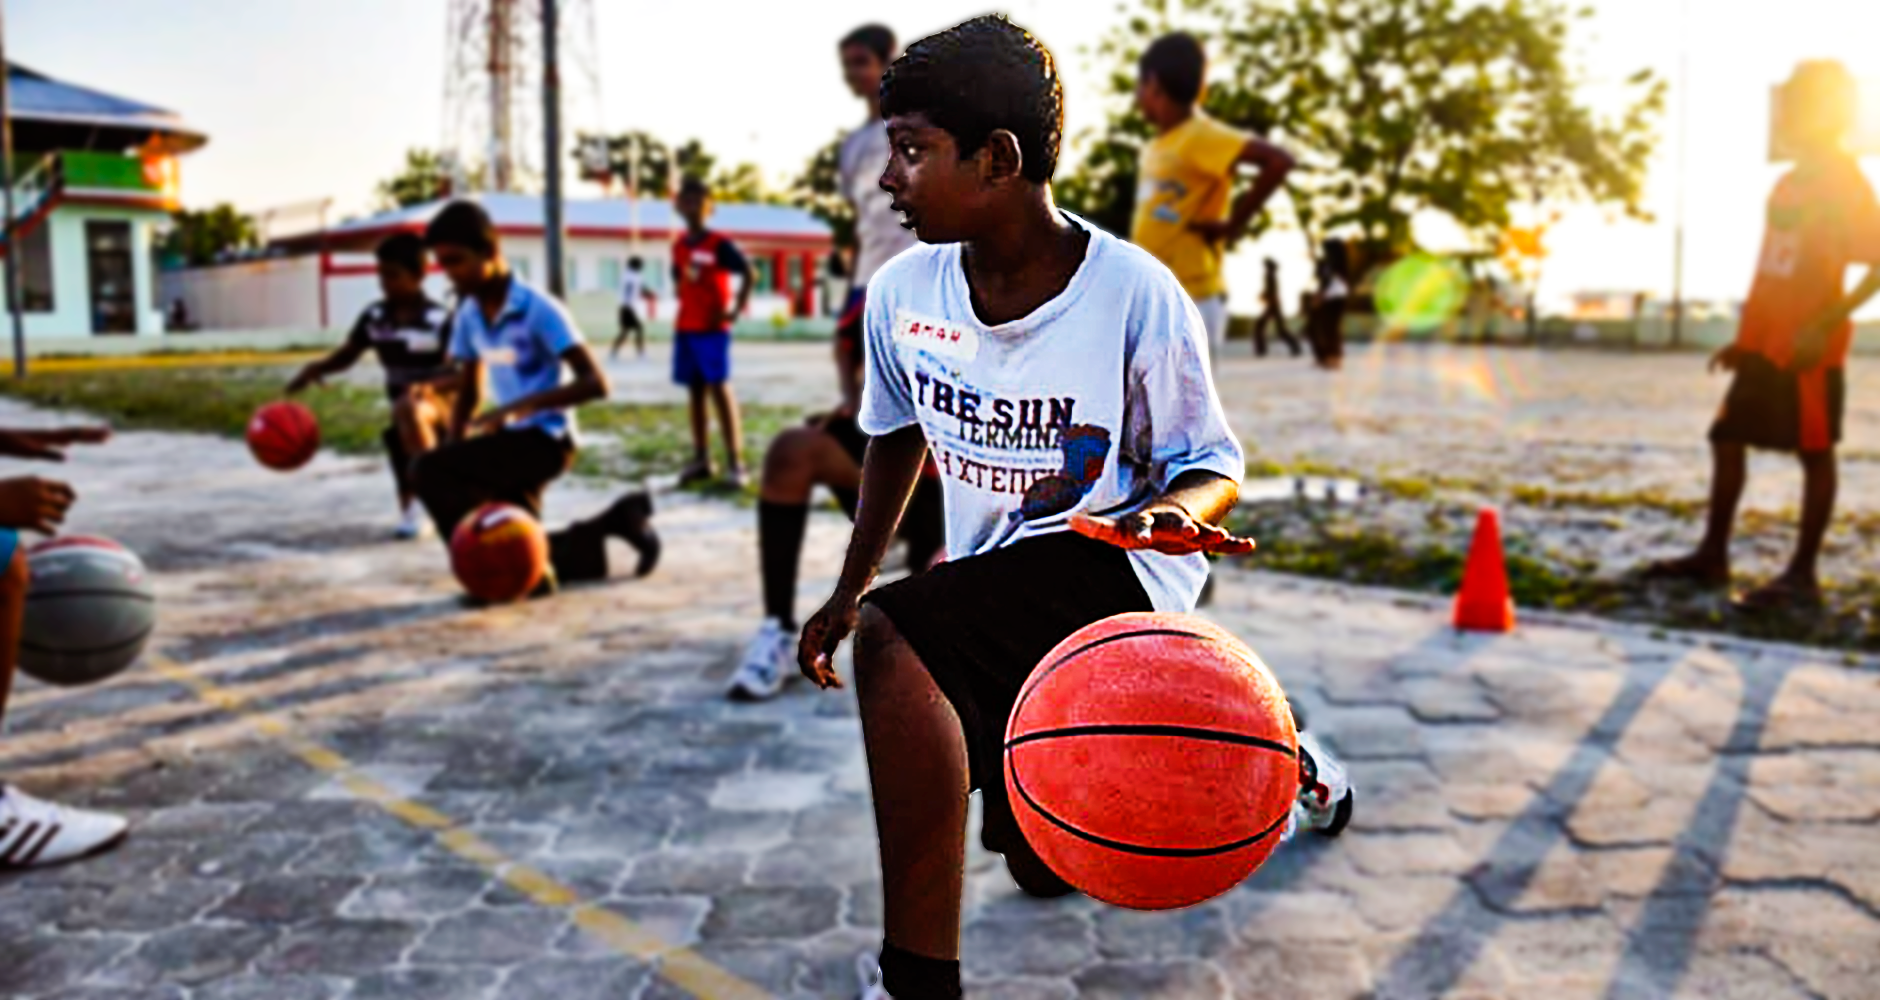 4-indian basketball